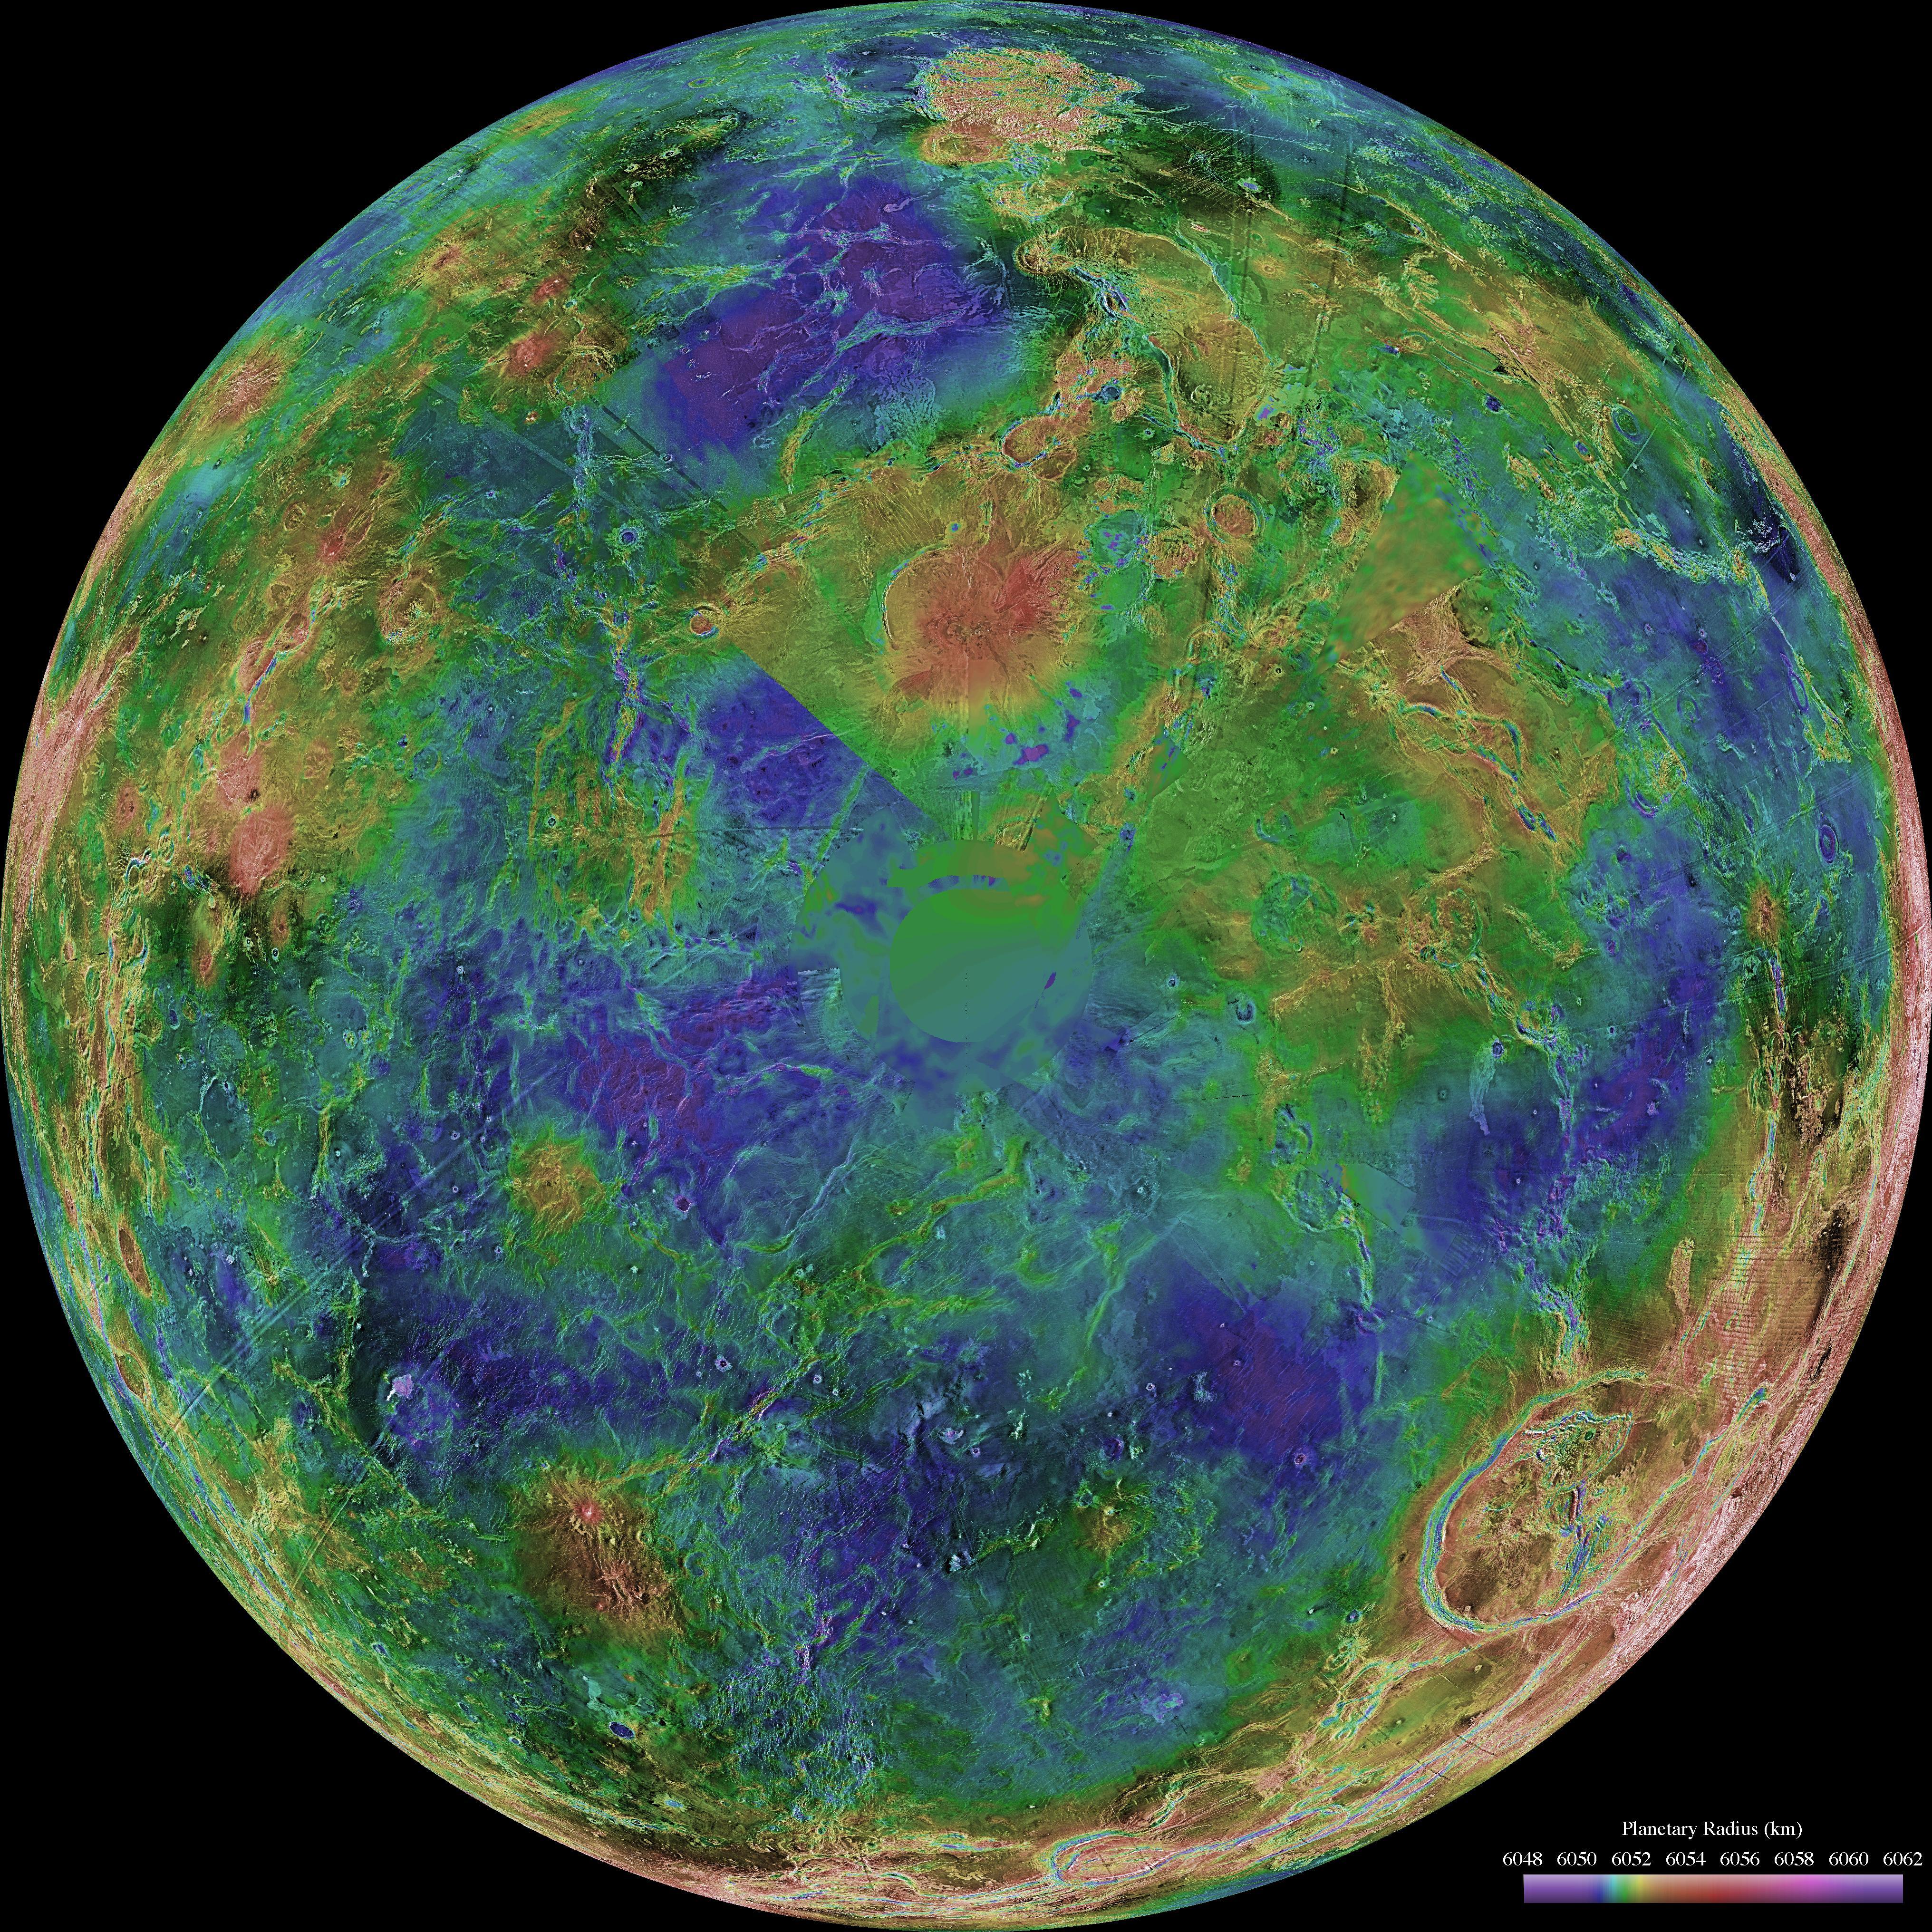 File:Venus Topo South, 777-,663,-114.jpg - Wikimedia Commons